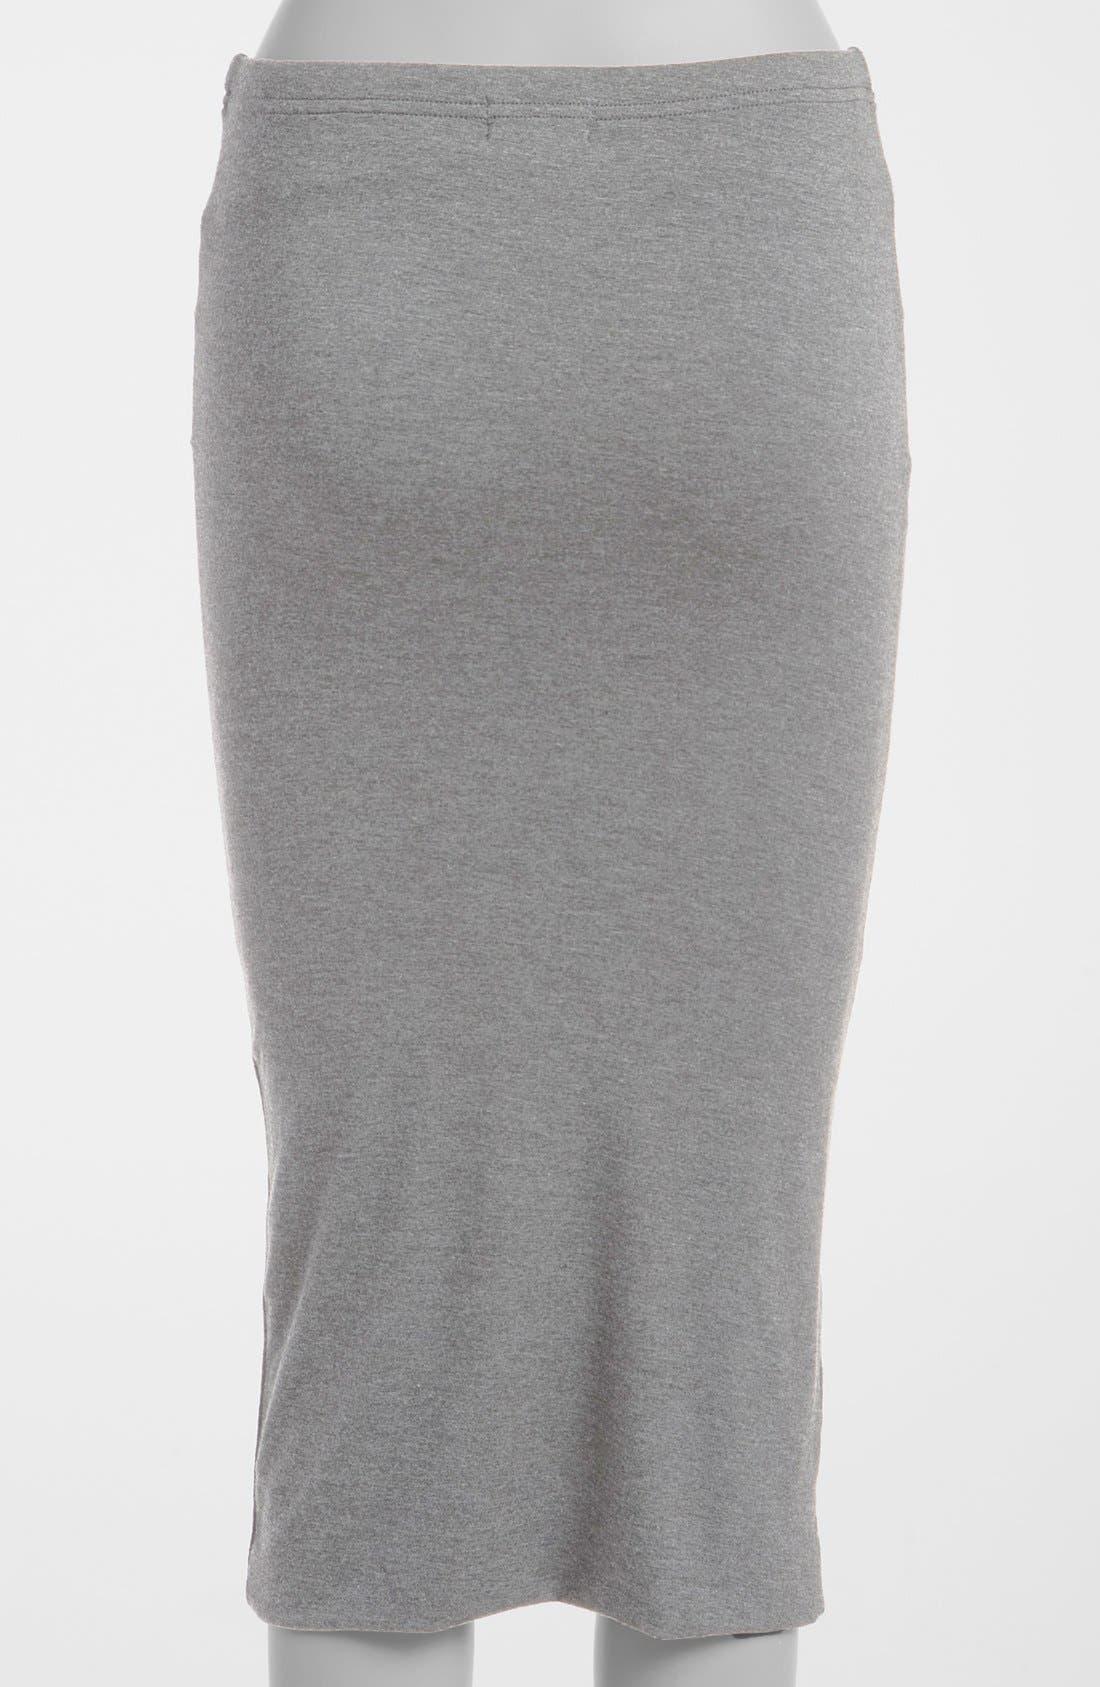 Double Layered Tube Skirt,                             Alternate thumbnail 23, color,